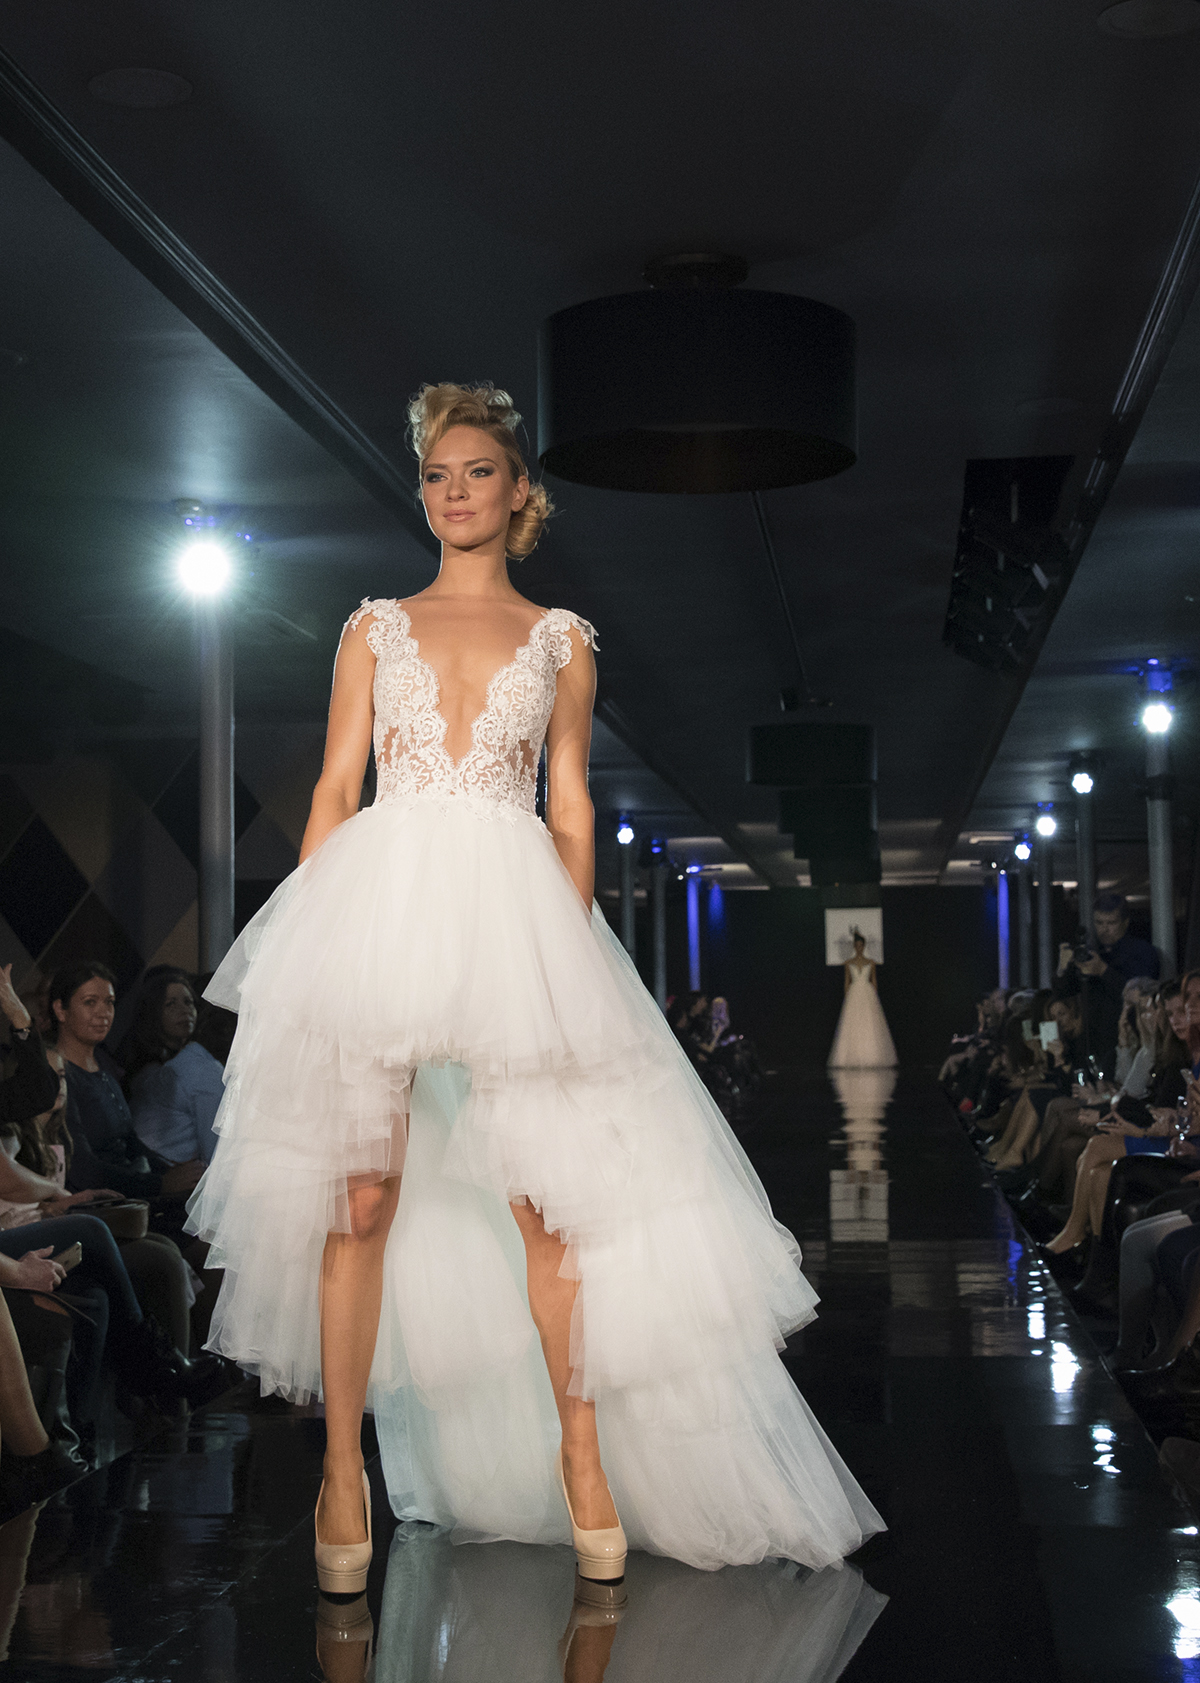 halasz-eva-couture-eskuvo-classic-menyasszonyi-ruha-oszlop.jpg